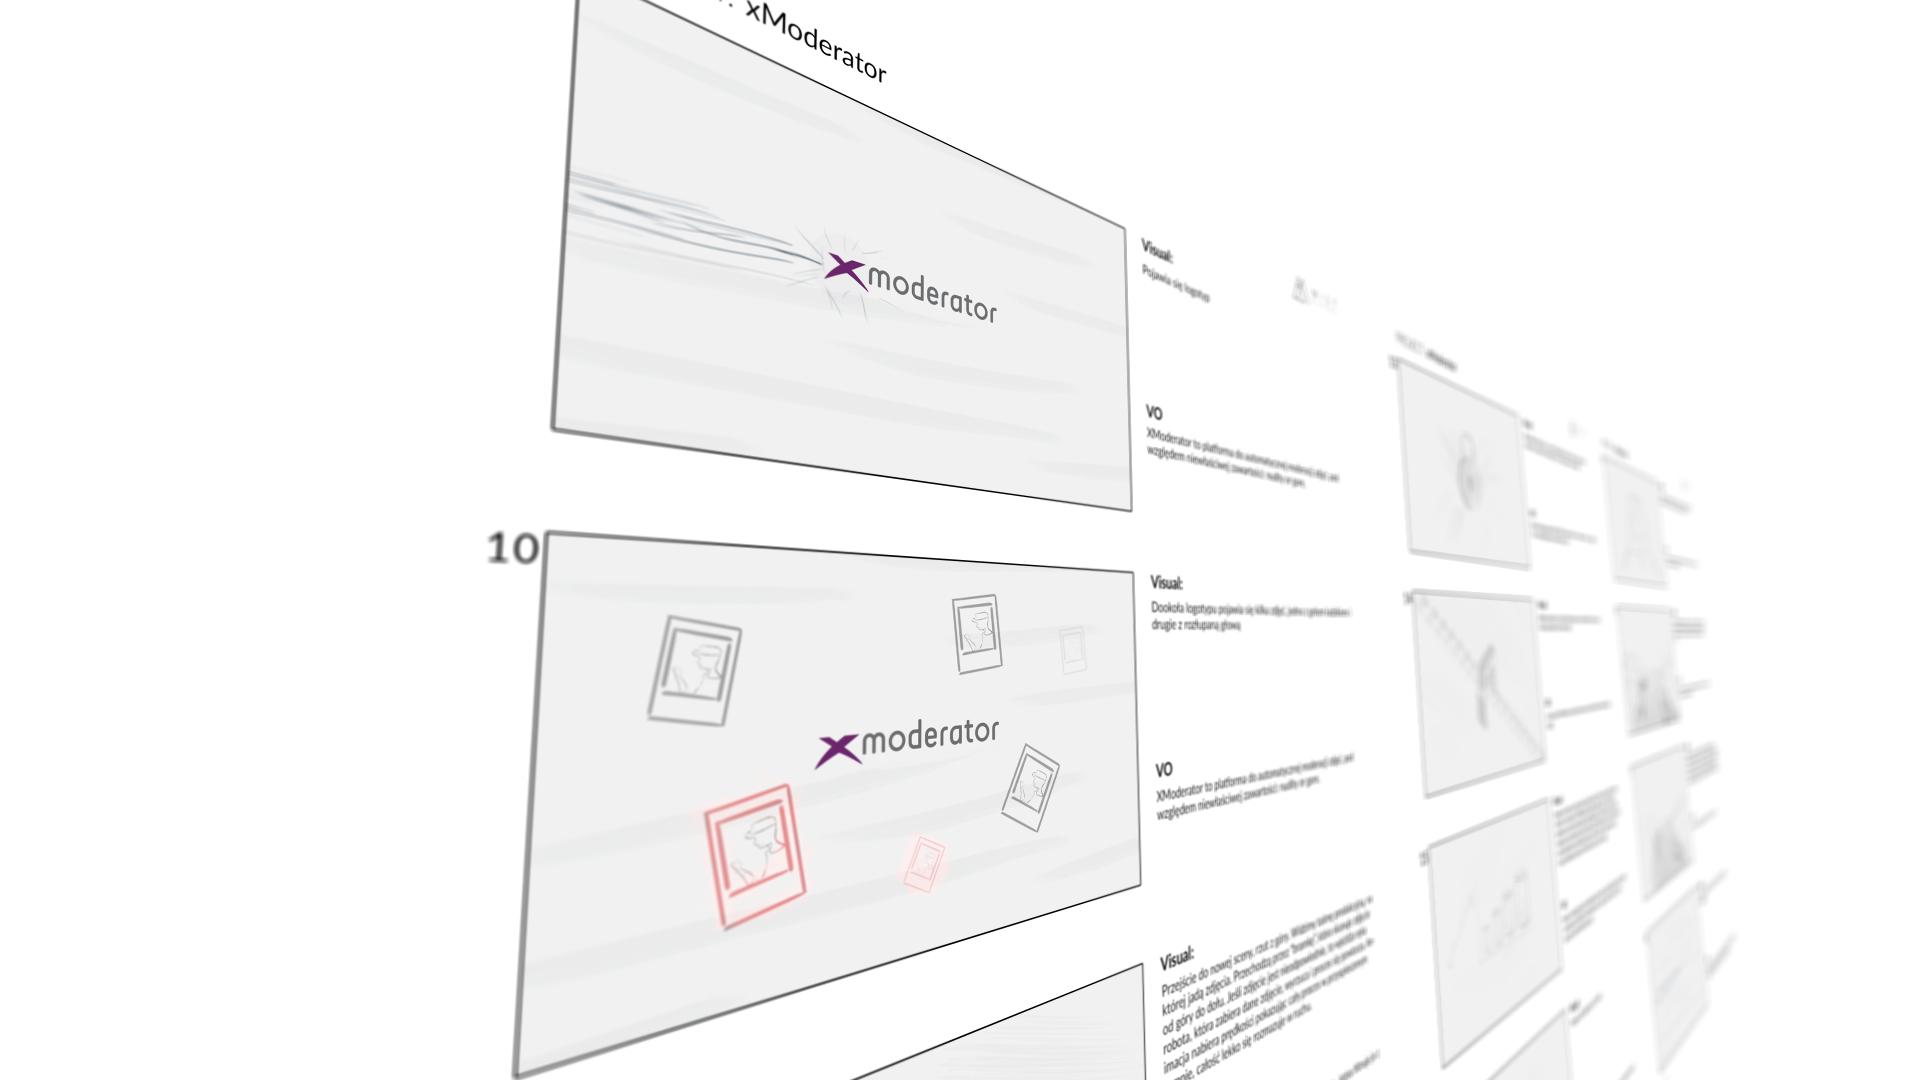 Mist Visual - Studio Animacji. Storyboard do animacji xModerator Video Explainer